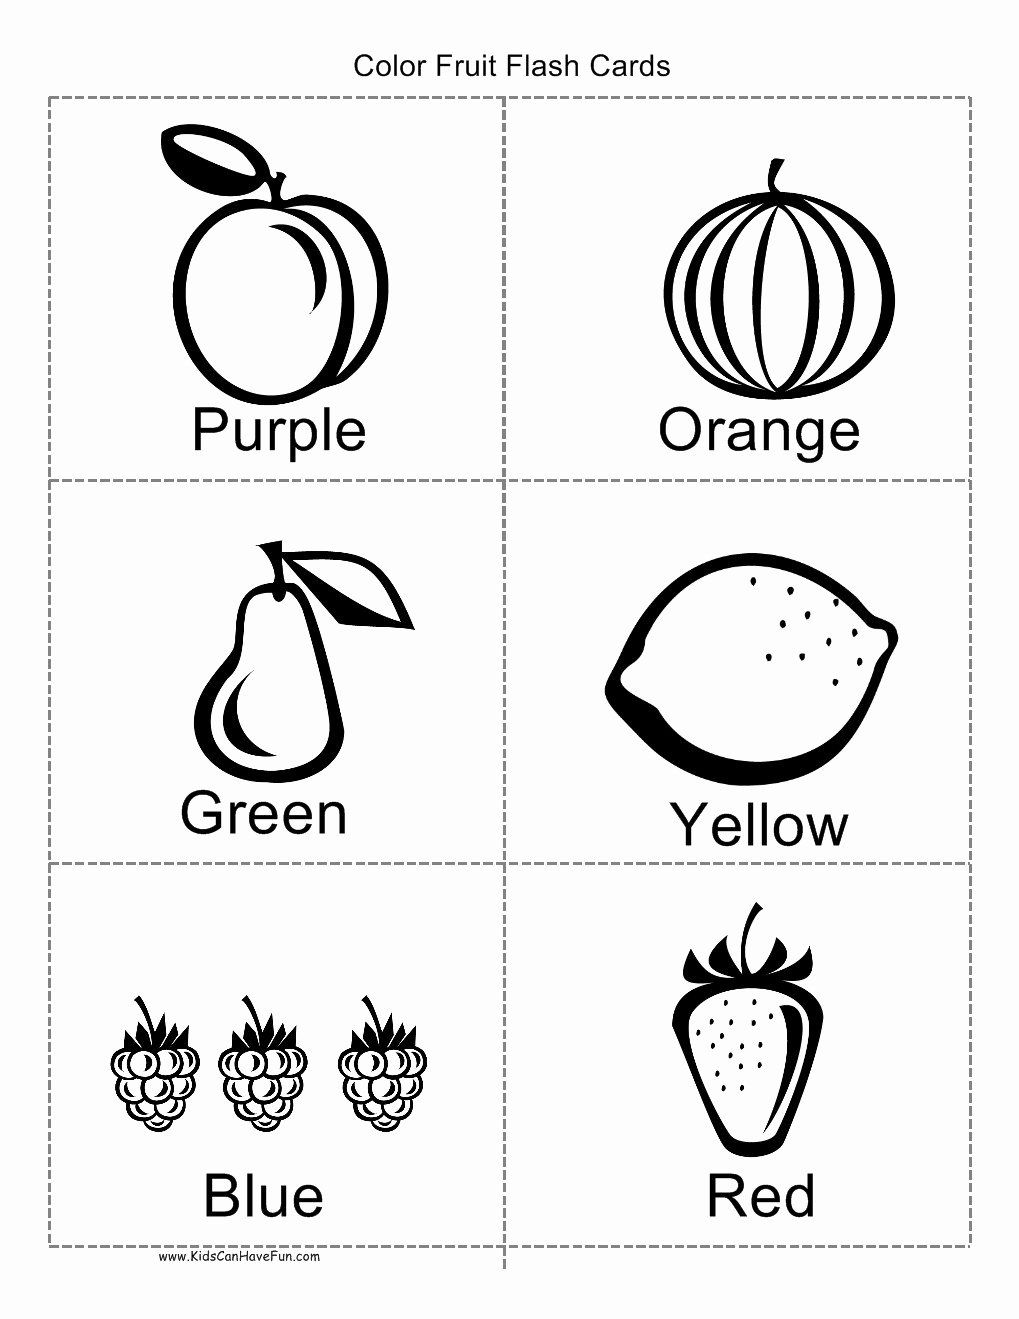 Apple Coloring Pages For Kindergarten Unique Colored Fruit Coloring Pages Coloring Worksheets For Kindergarten Kindergarten Coloring Pages Kindergarten Colors Esl kindergarten coloring worksheets